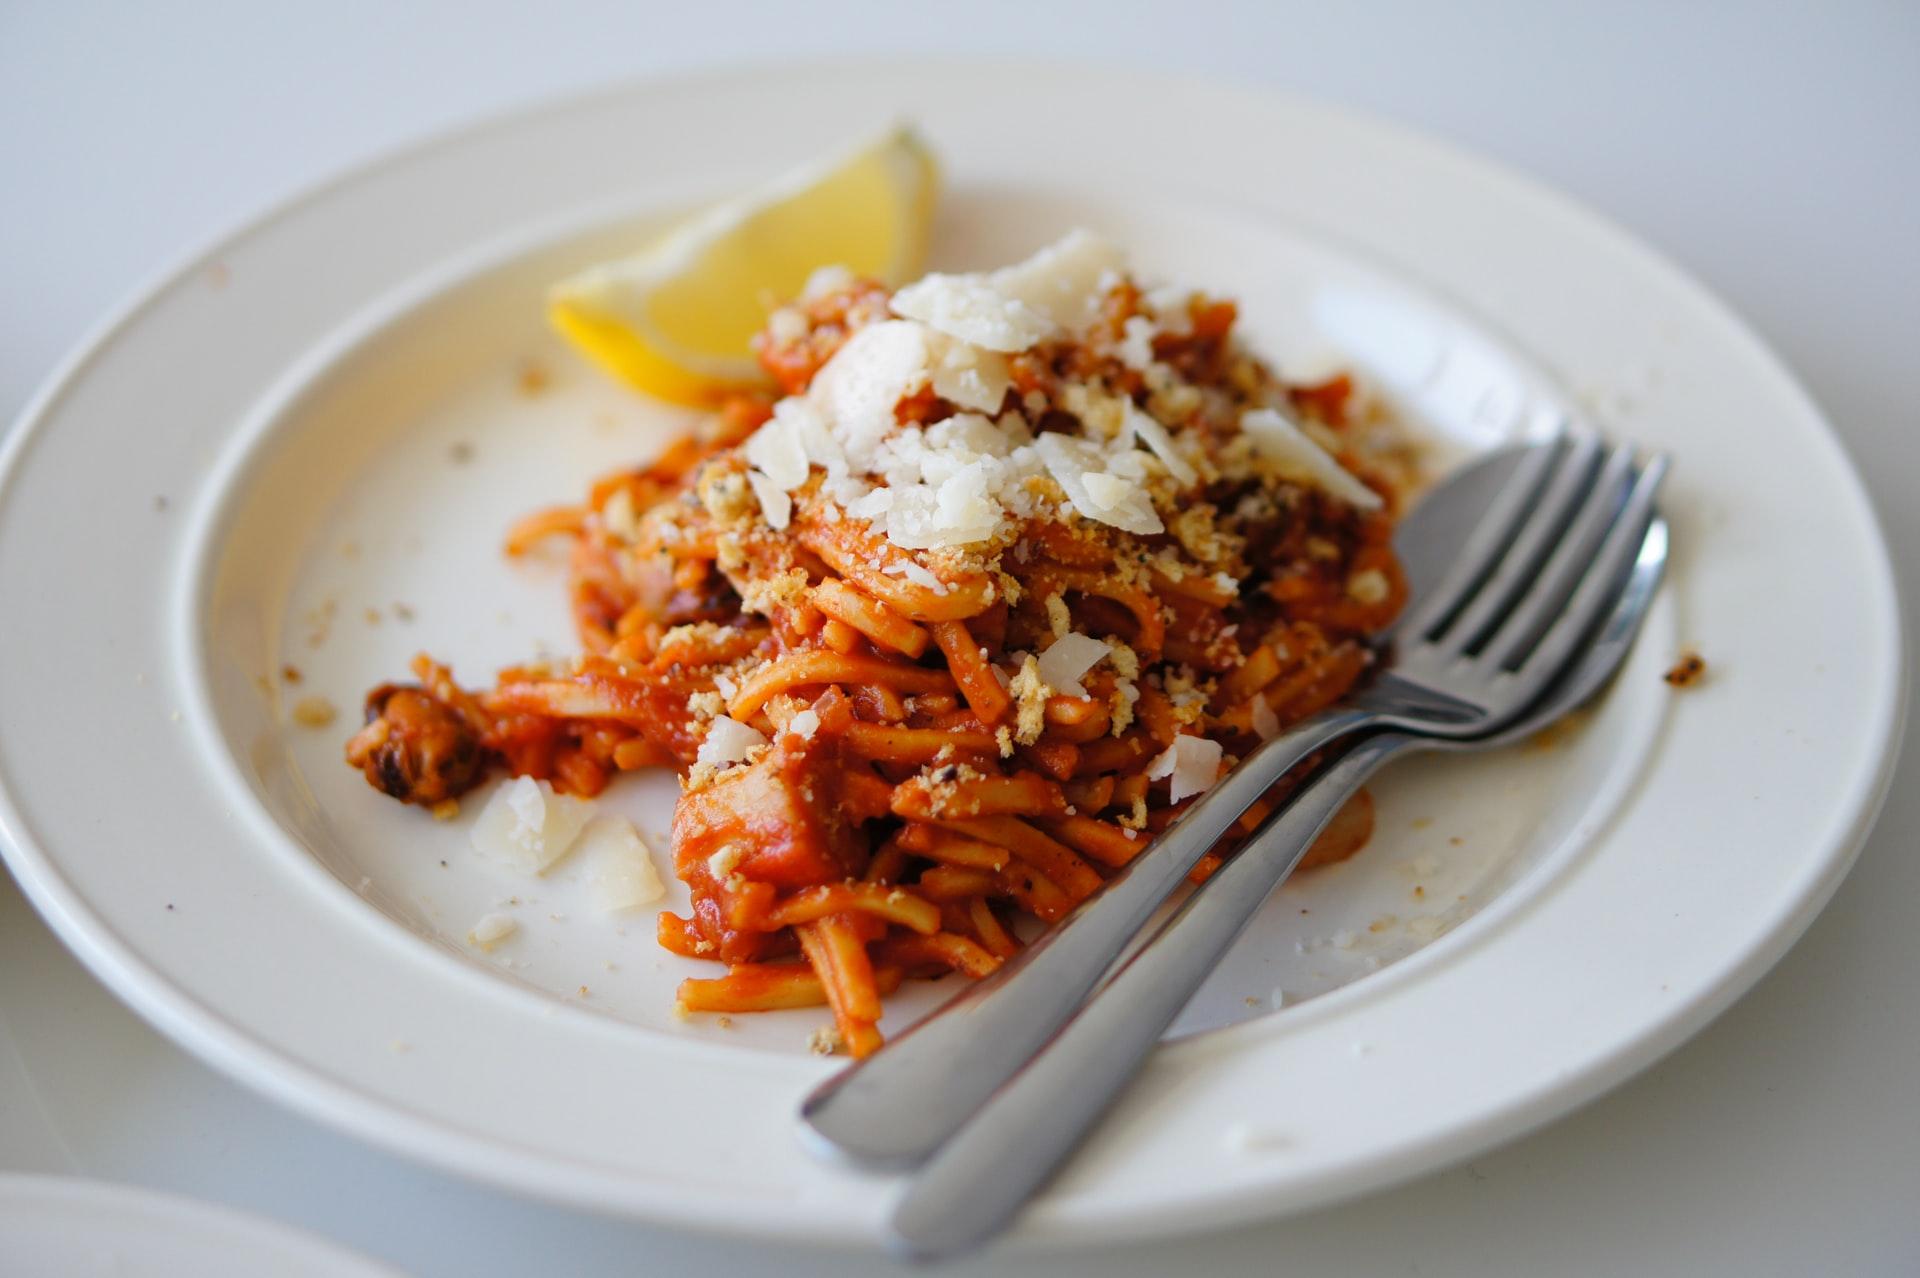 Plate of half eaten spaghettis with a lemon wedge